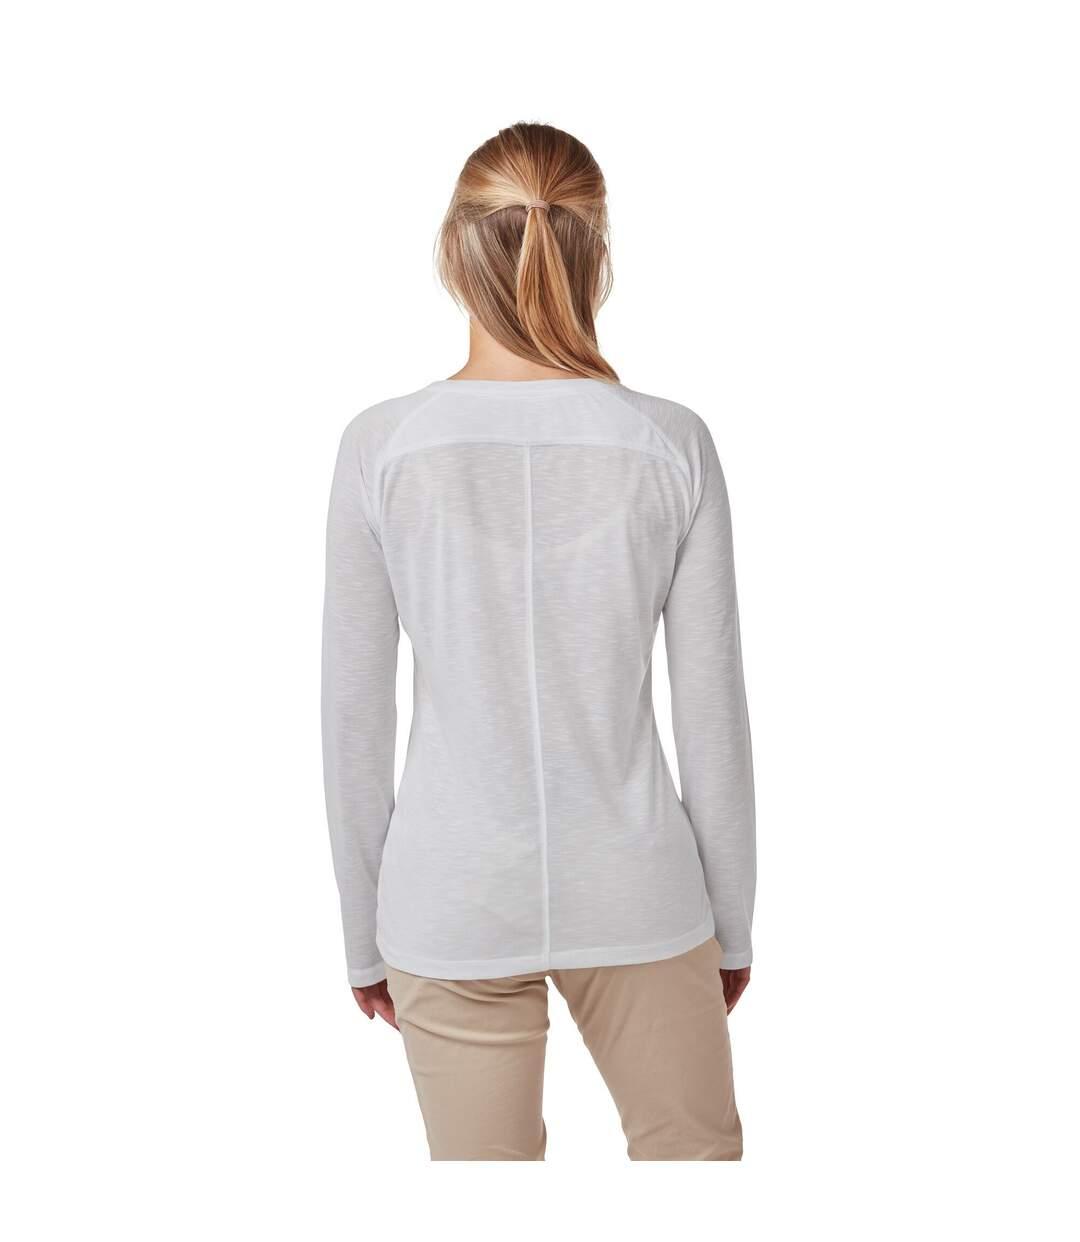 Craghoppers - Haut Manches Longues Kayla - Femme (Blanc) - UTCG1336